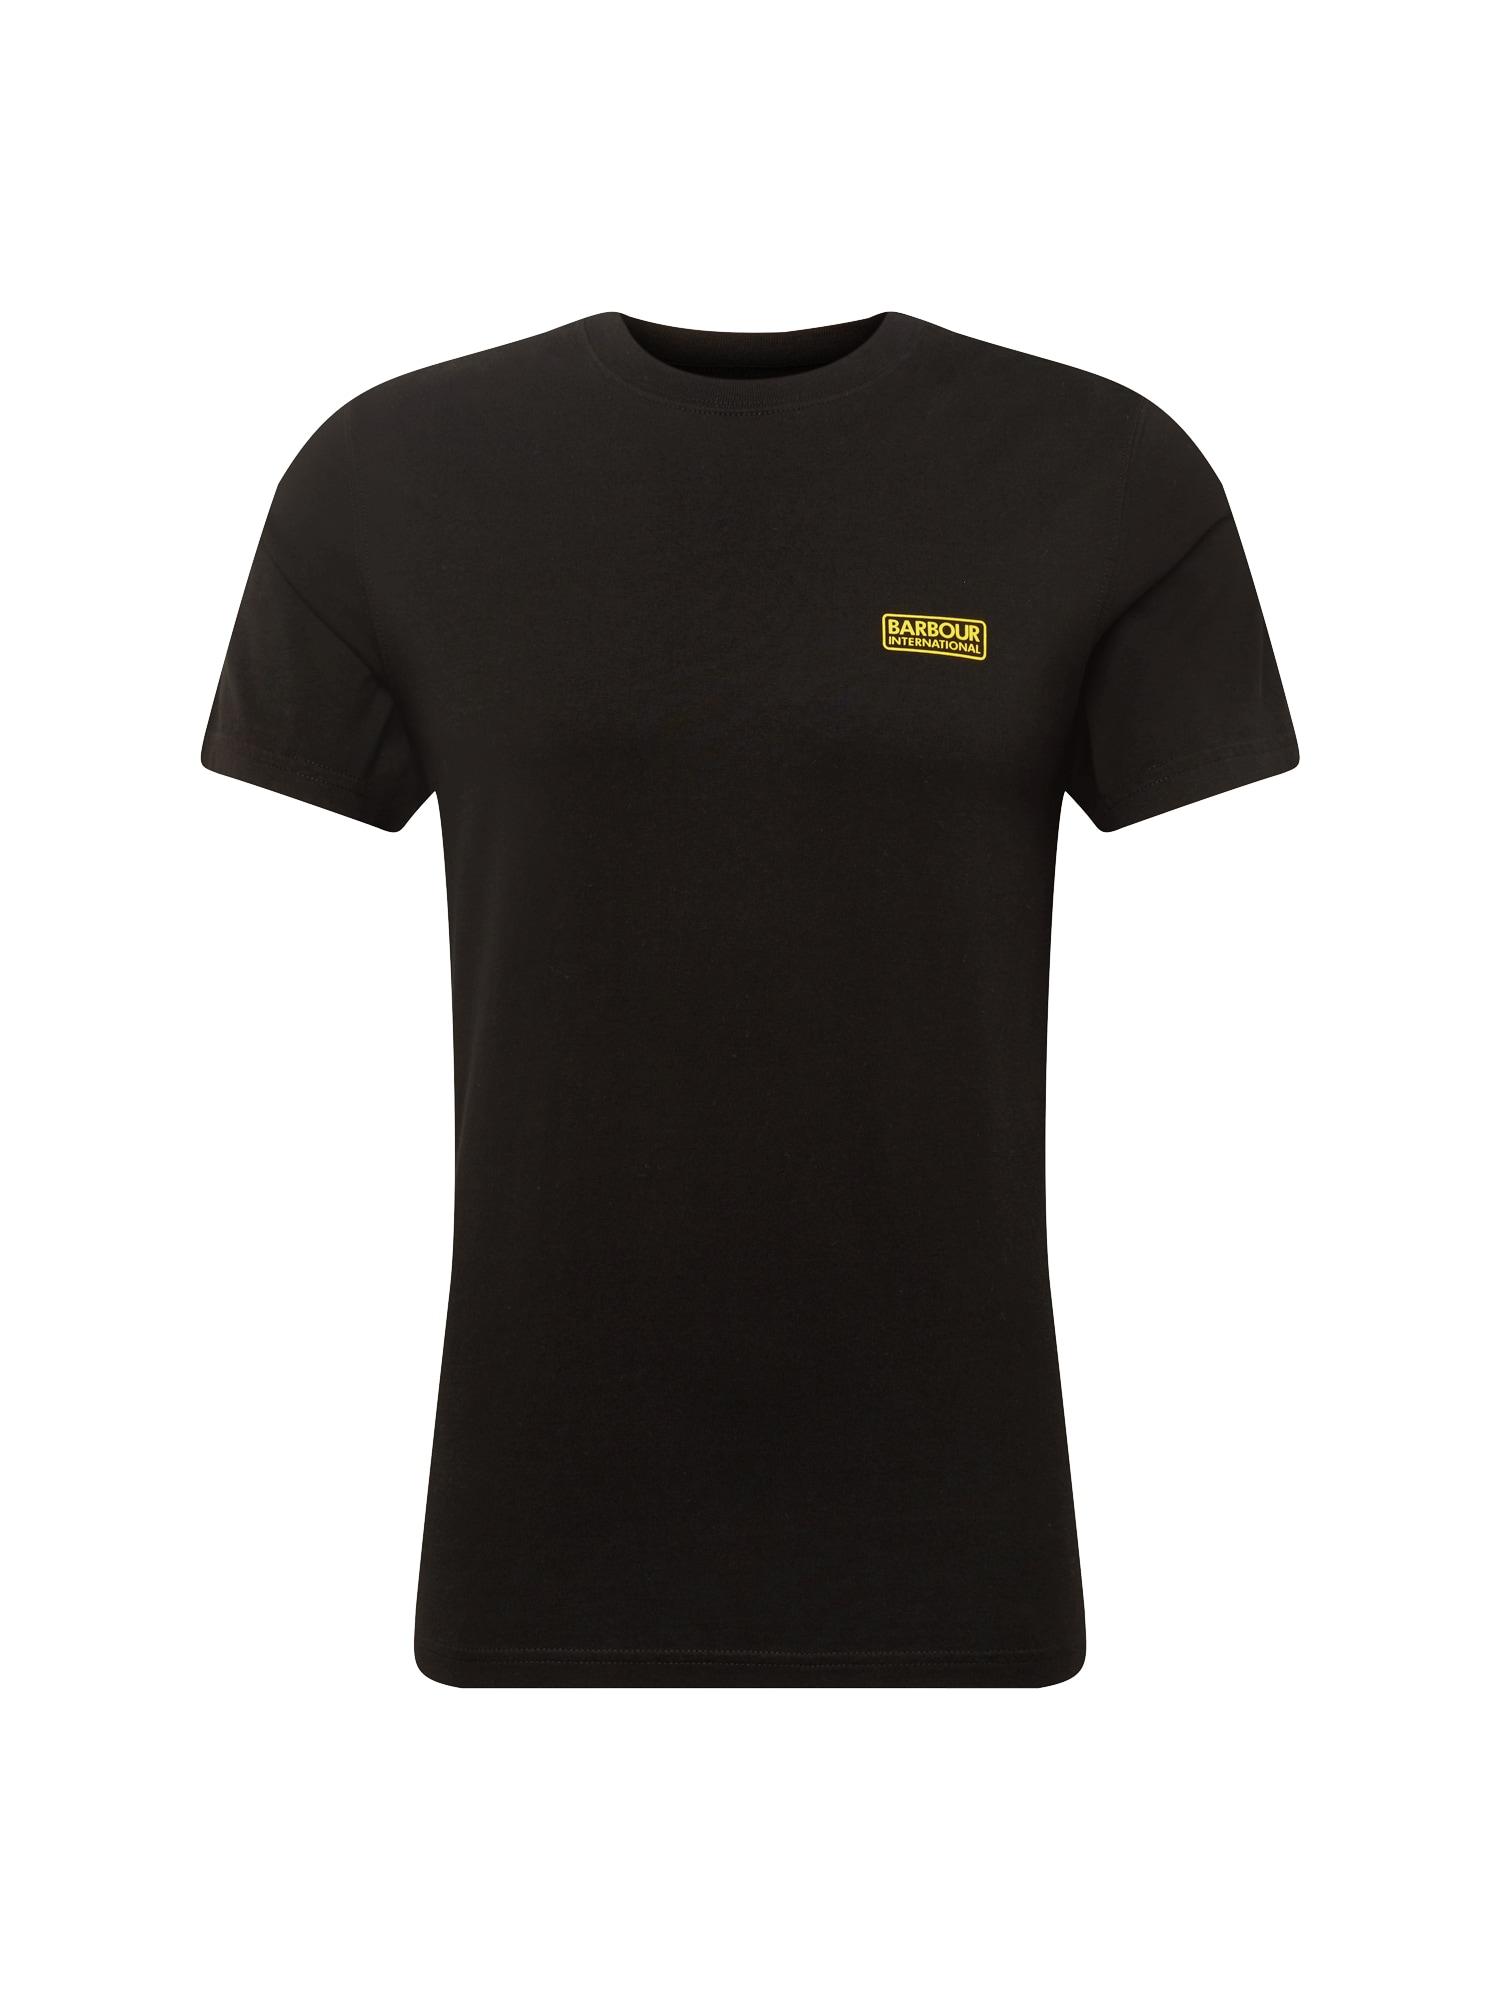 Tričko International Small žlutá černá Barbour International